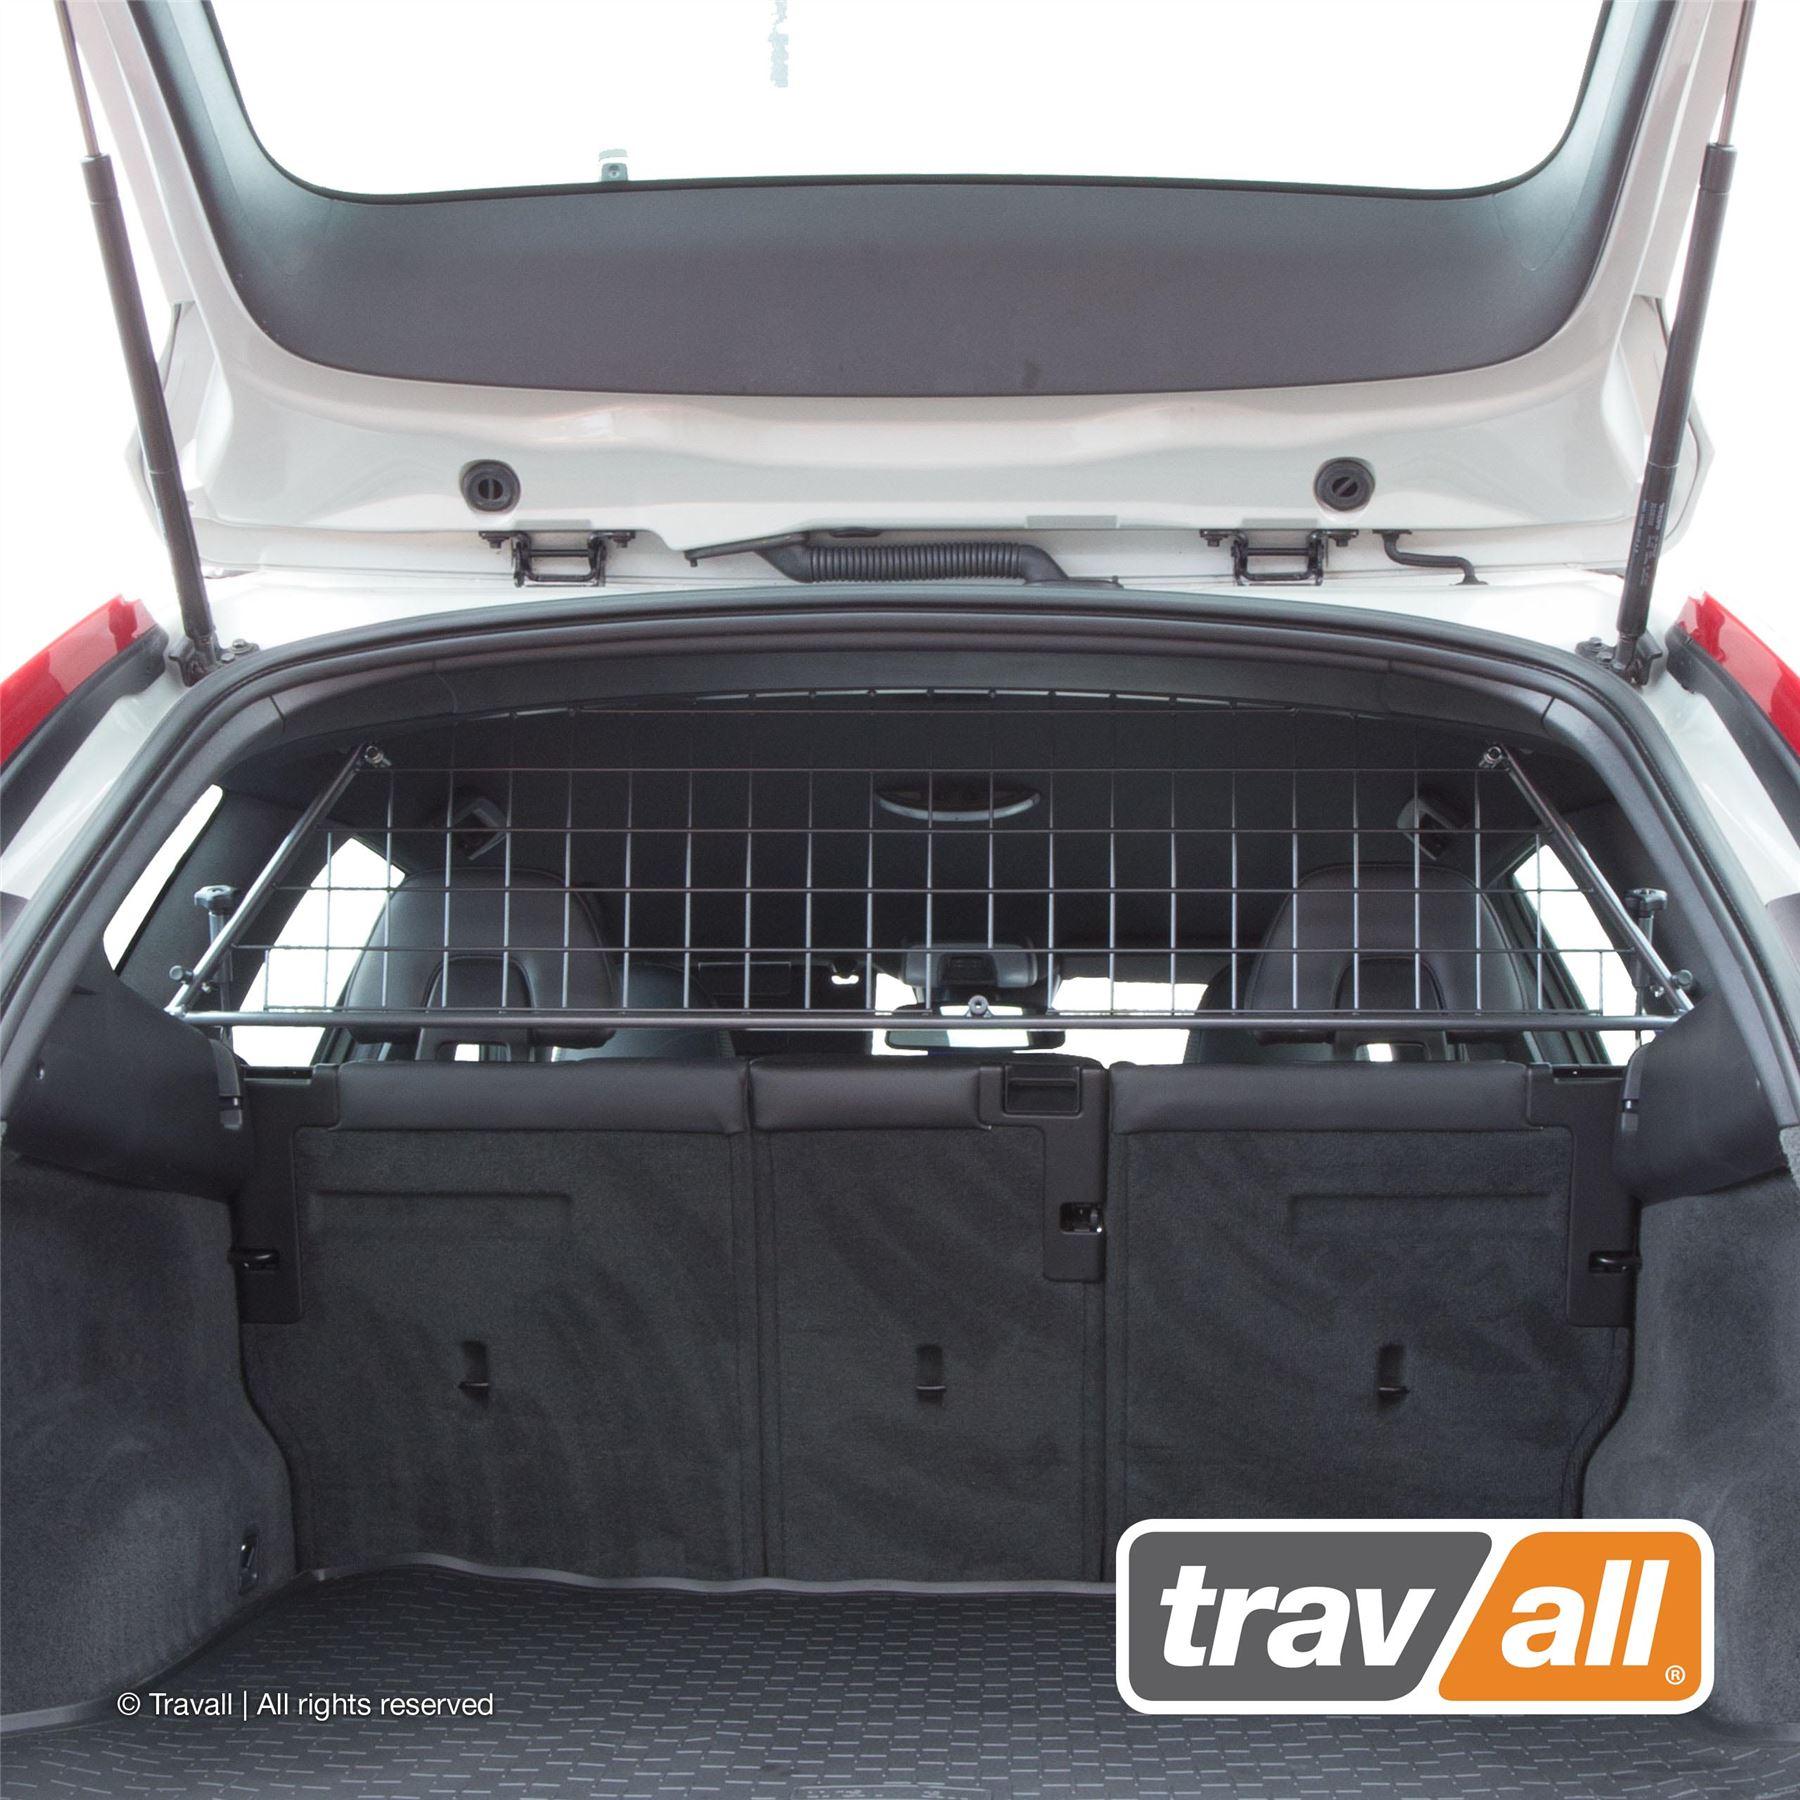 Rocker Cover Gasket Fits BMW Z4 E85 3.0 06 To 08 N52B30A BGA Qualité Remplacement